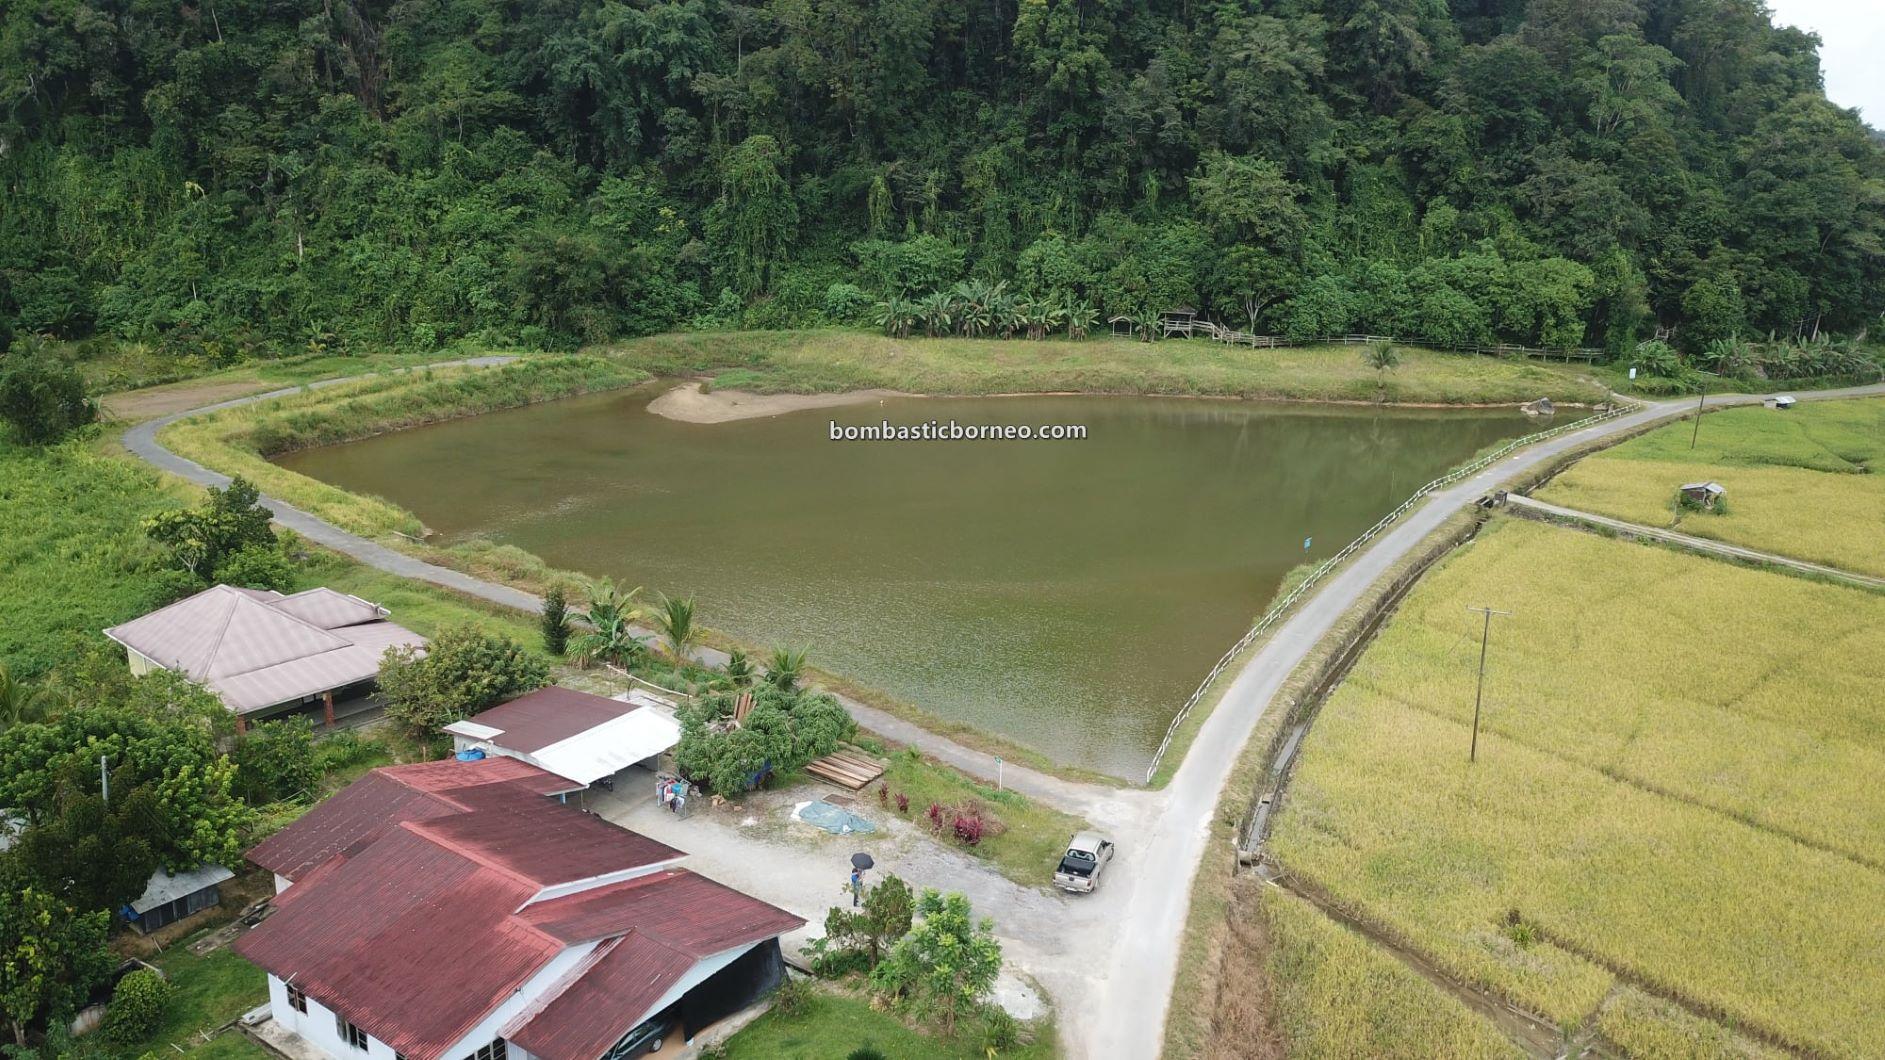 Paddy Field, Sawah Padi, Kampung Chupak, Dayak Bidayuh village, Sarawak, Malaysia, authentic, traditional, destination, nature, Tourism, travel guide, Gua Raya, Cave, Borneo